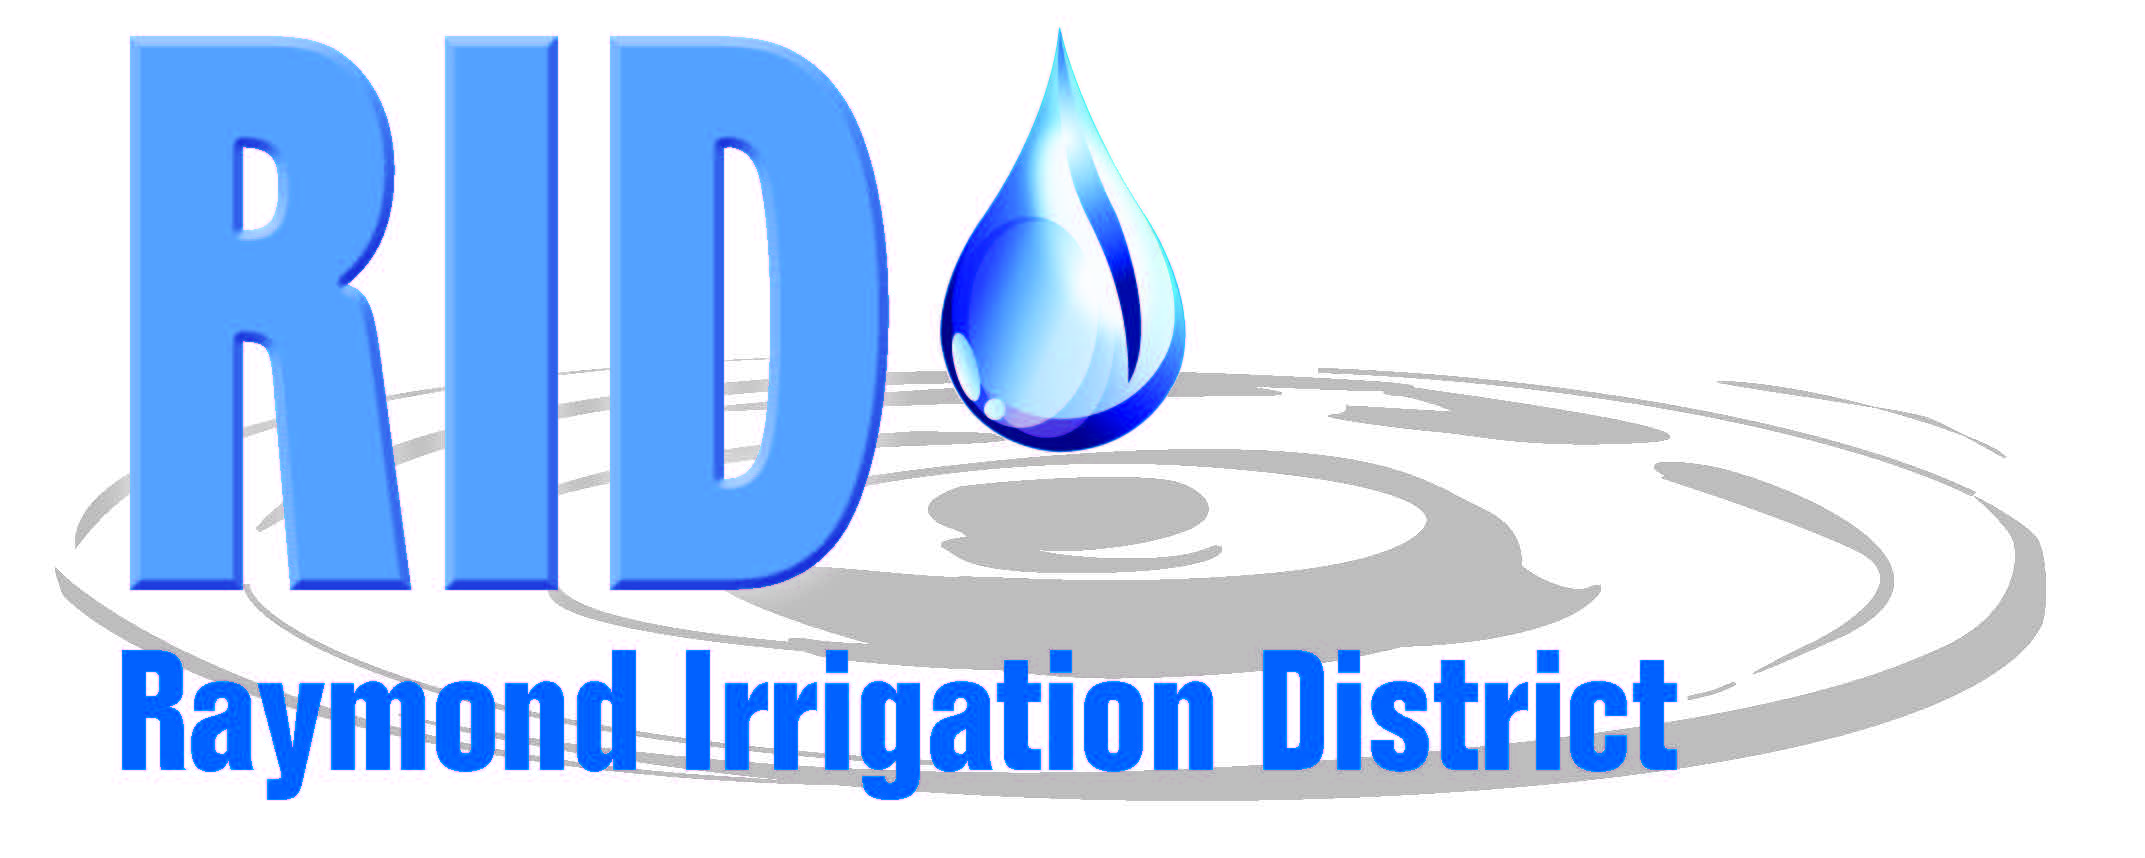 Copy of Raymond Irrigation District logo.jpg